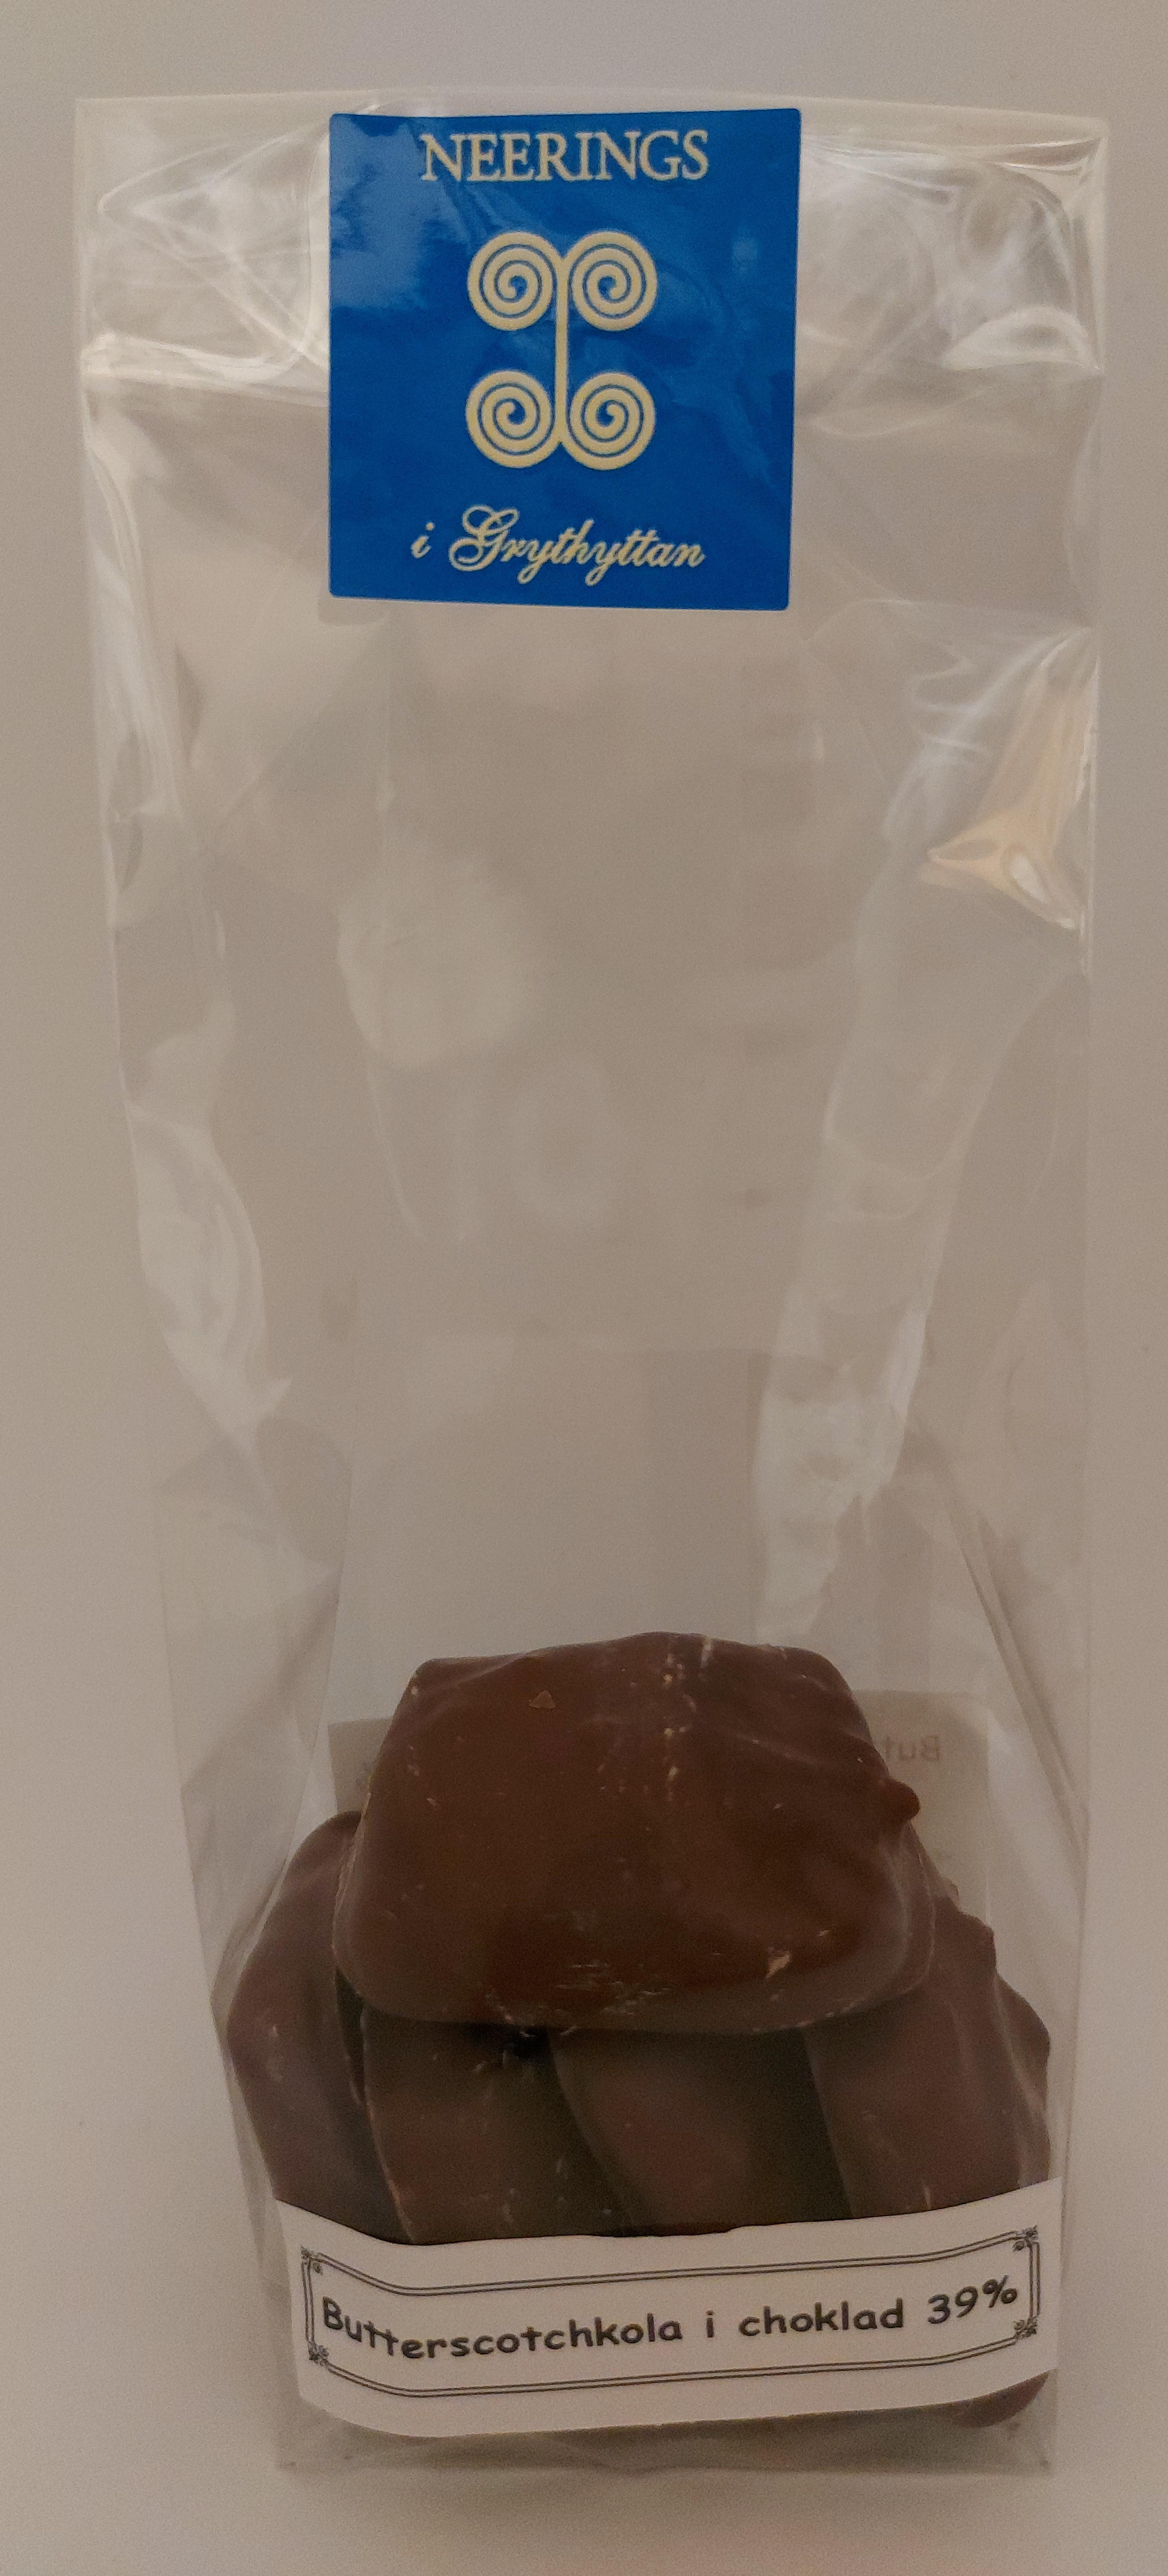 Butterscotchkola i choklad 39%